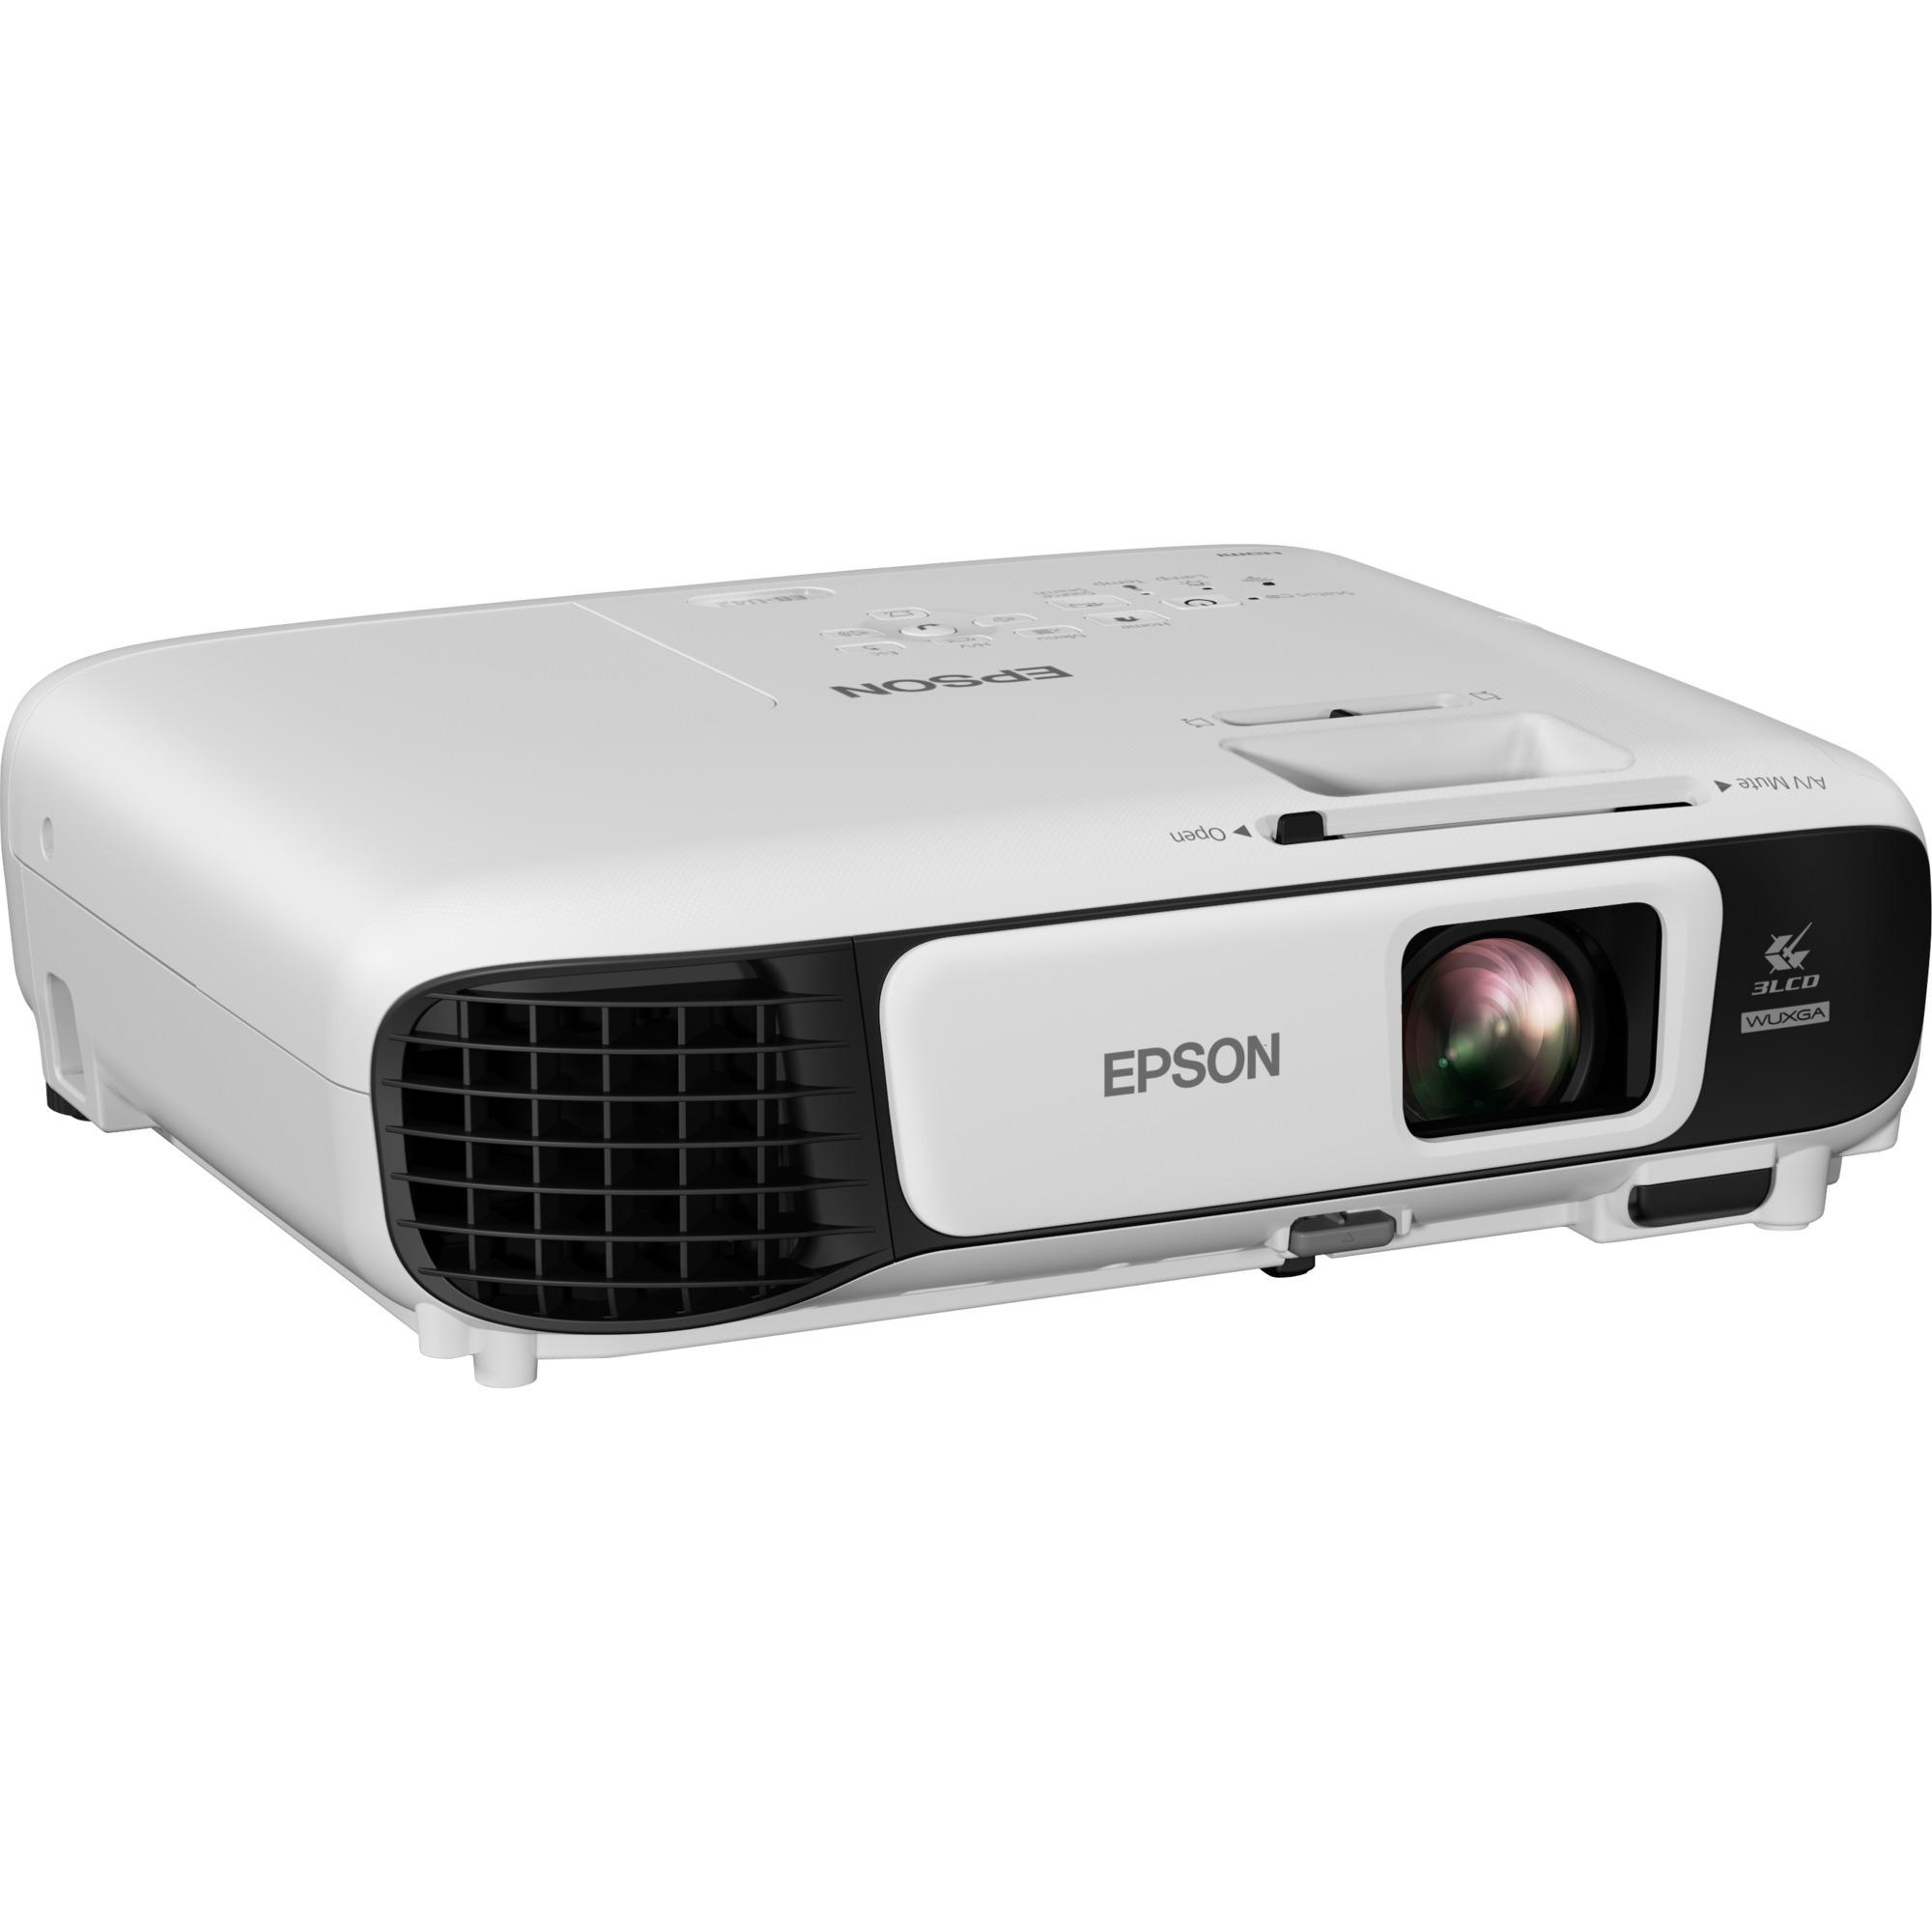 EB-U42 Vidéoprojecteur portable 3600ANSI lumens 3LCD 1080p (1920x1080) Noir, Blanc vidéo-projecteur, Projecteur LCD